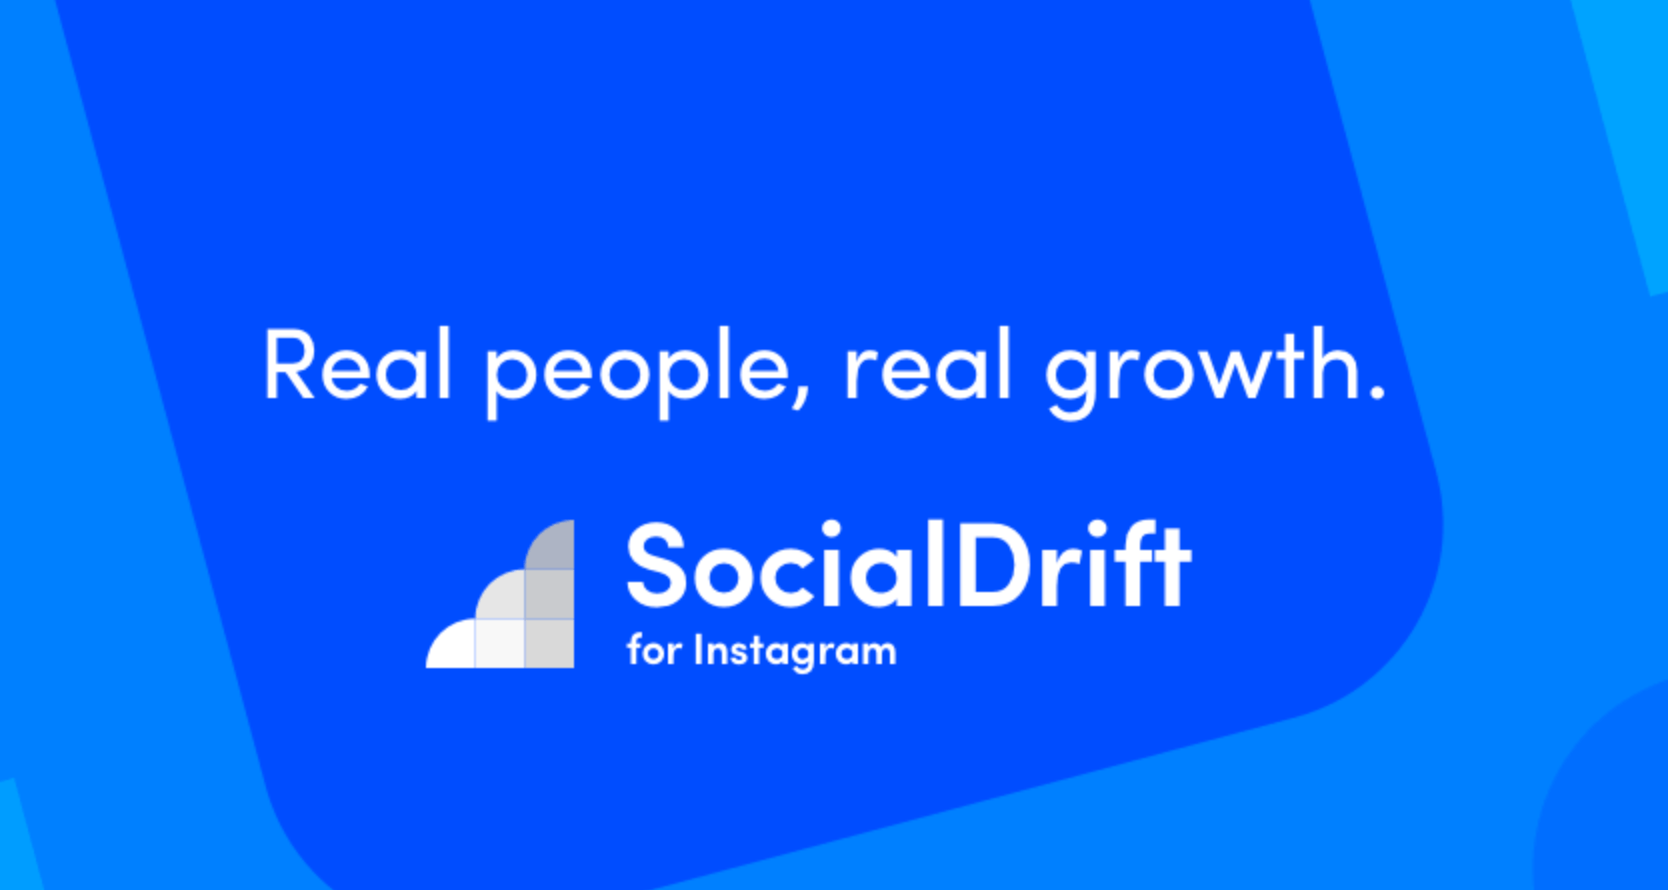 socialdrift-review - Social Media Tools For Marketing